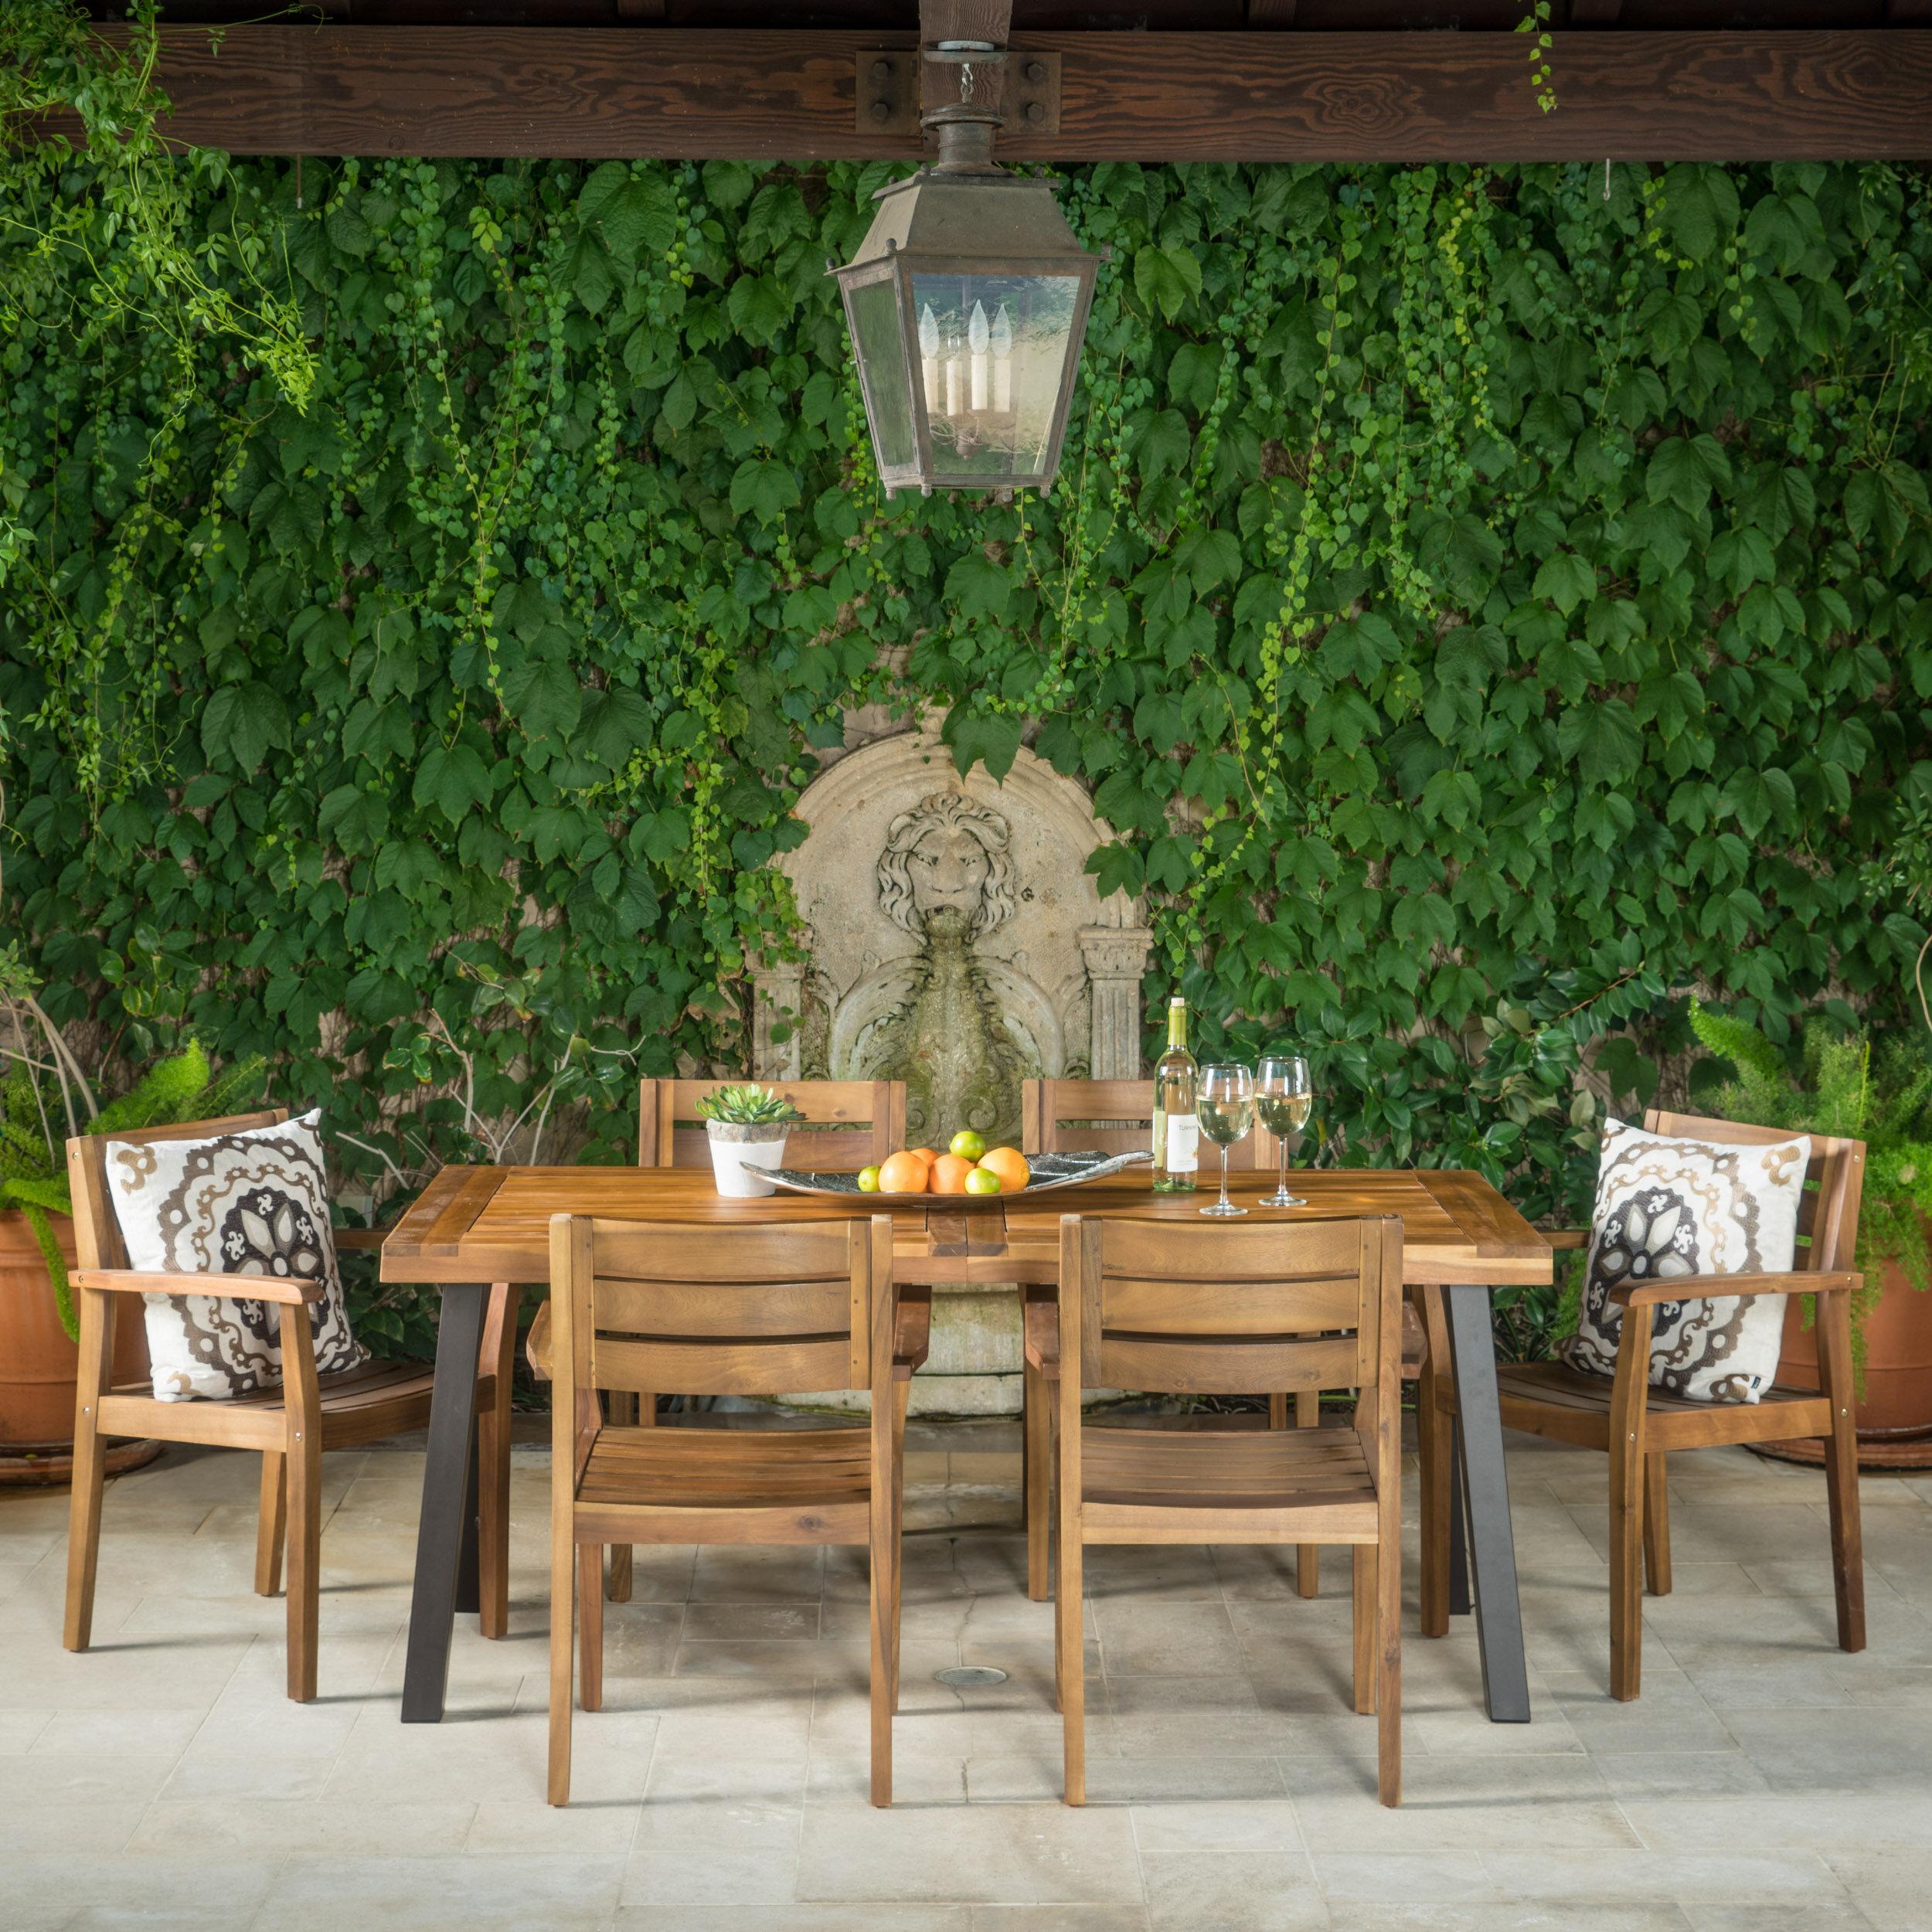 Union Rustic Adair Outdoor 7 Piece Dining Set U0026 Reviews | Wayfair